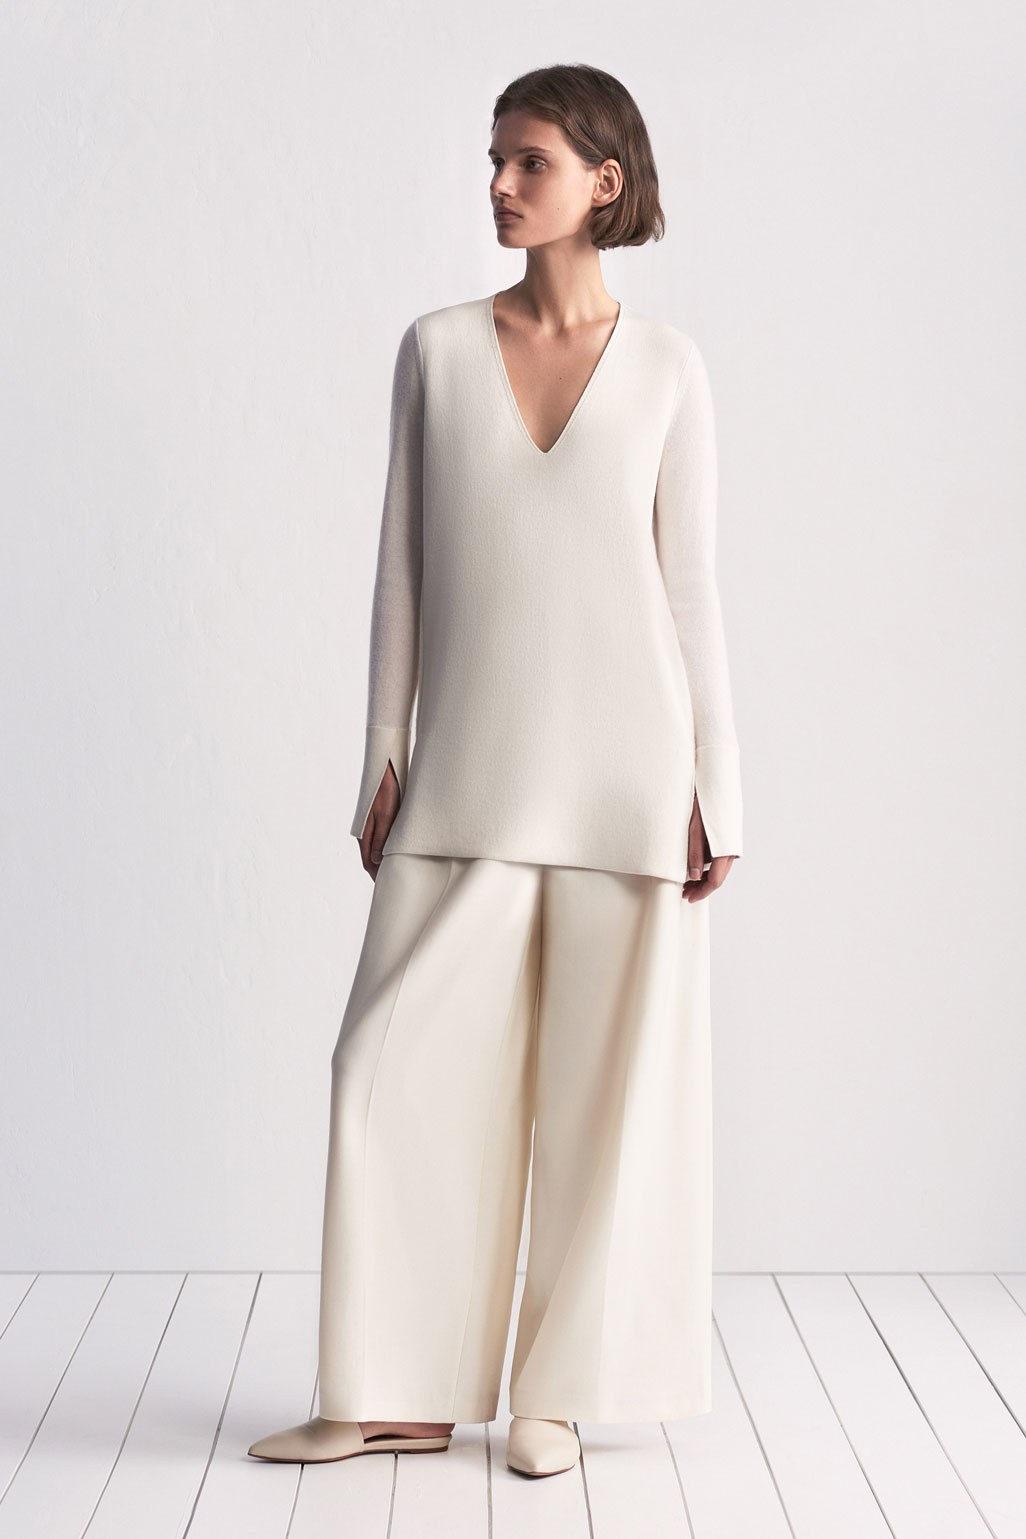 TSE элегантная кофта белого цвета 2019 с разрезами на рукавах